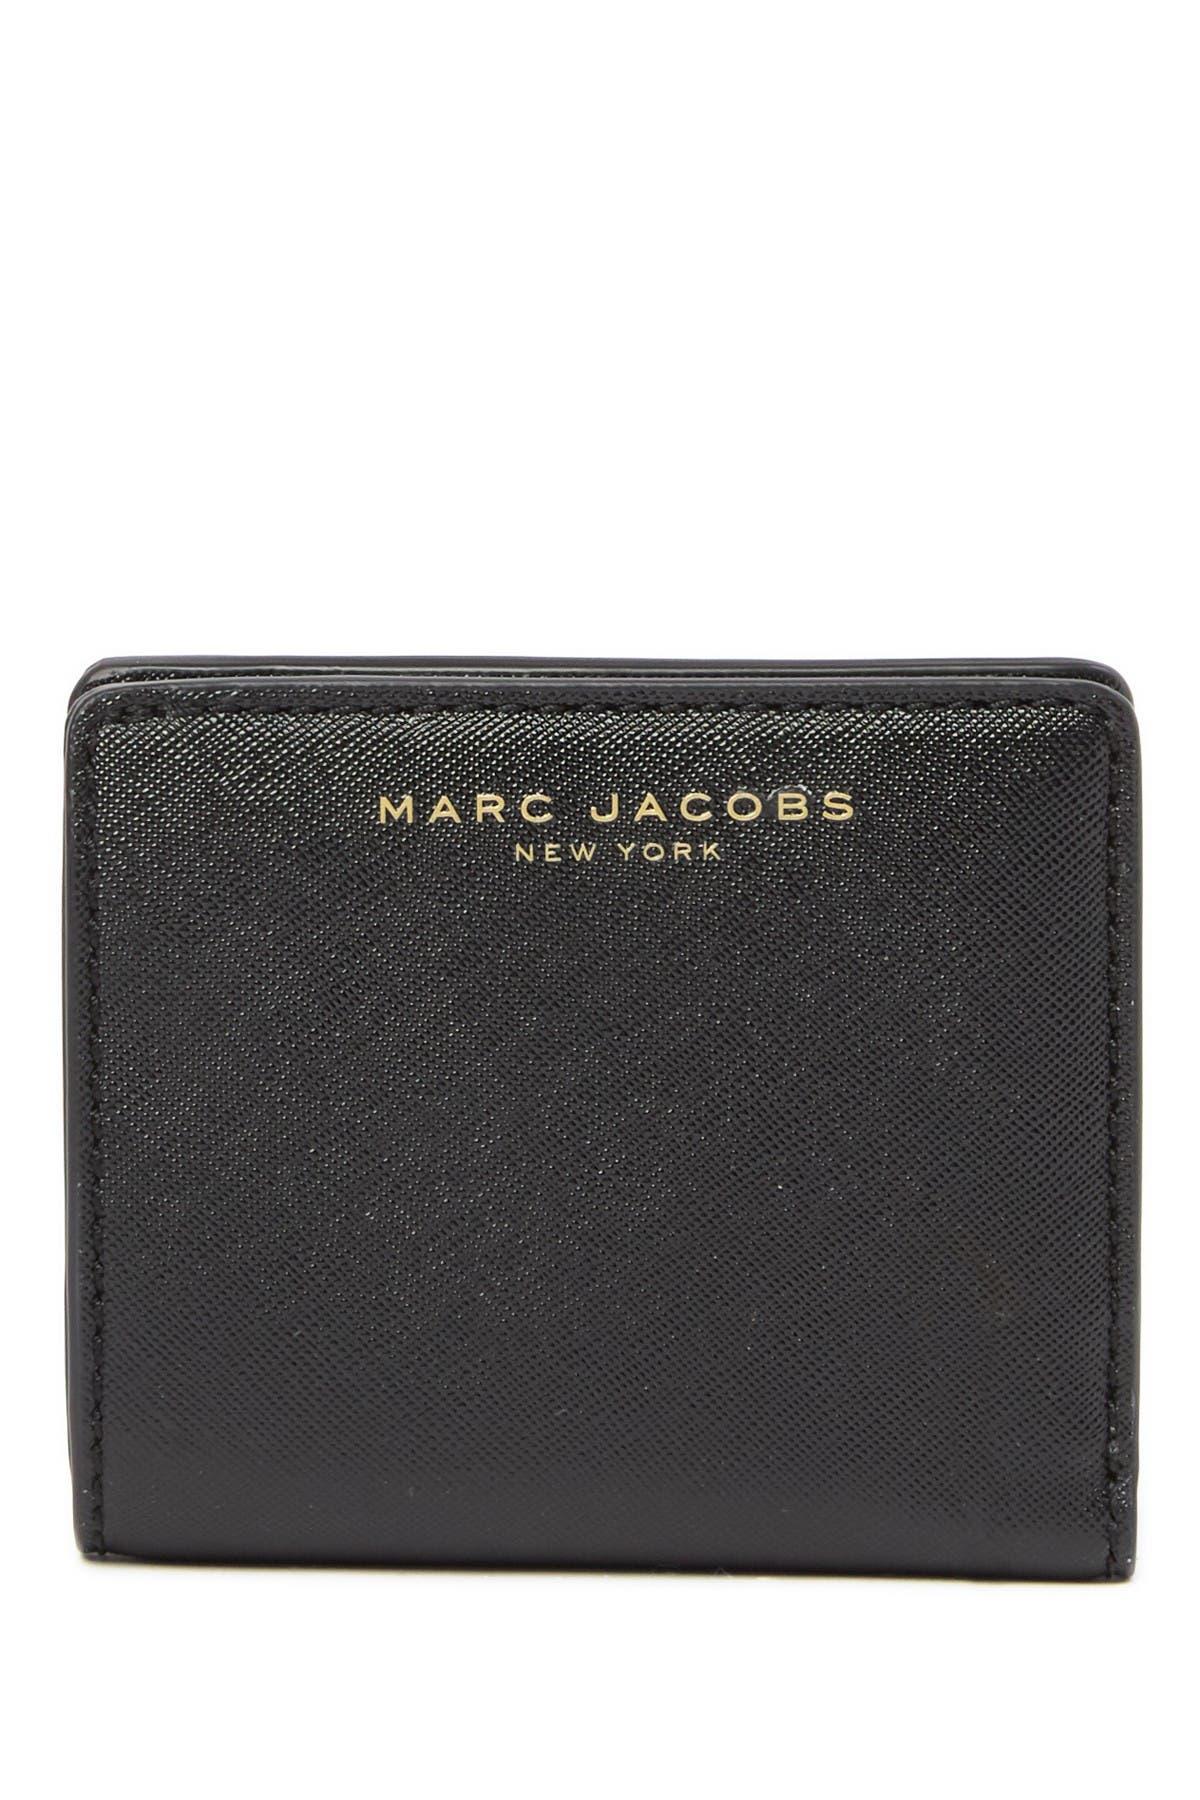 Image of Marc Jacobs Saffiano Bi-Fold Wallet